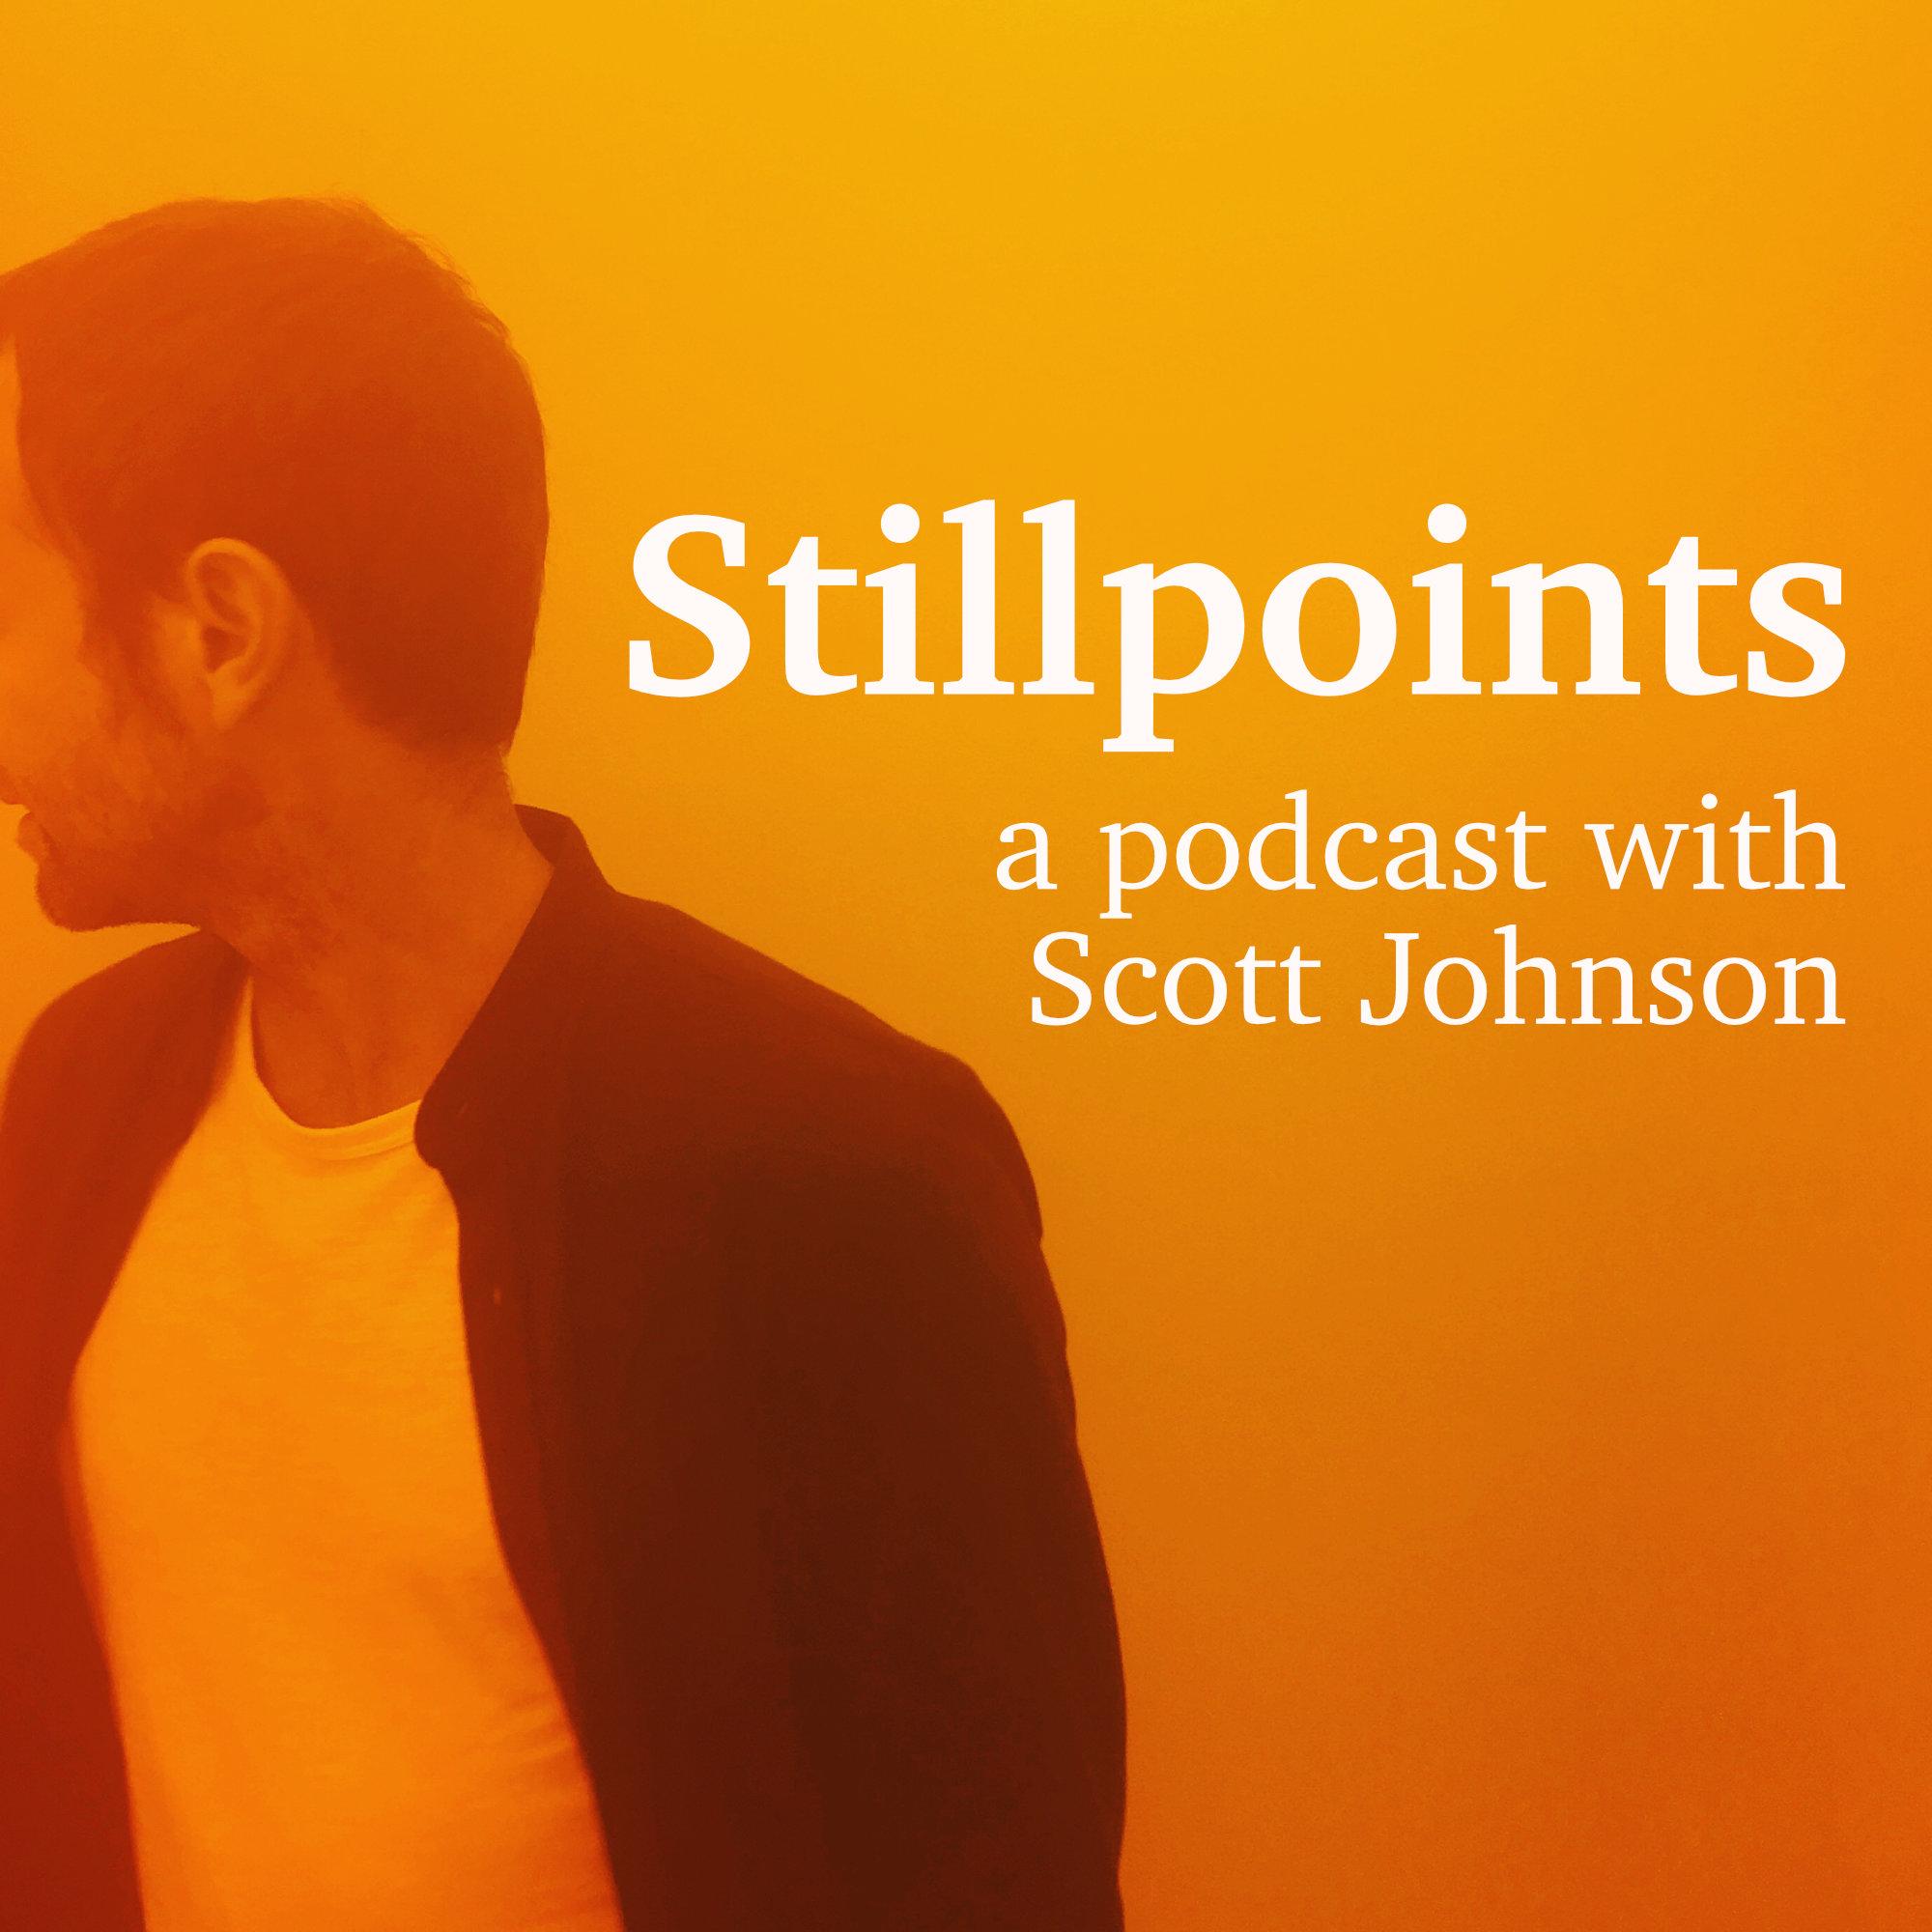 Stillpoints: A Podcast with Scott Johnson show art